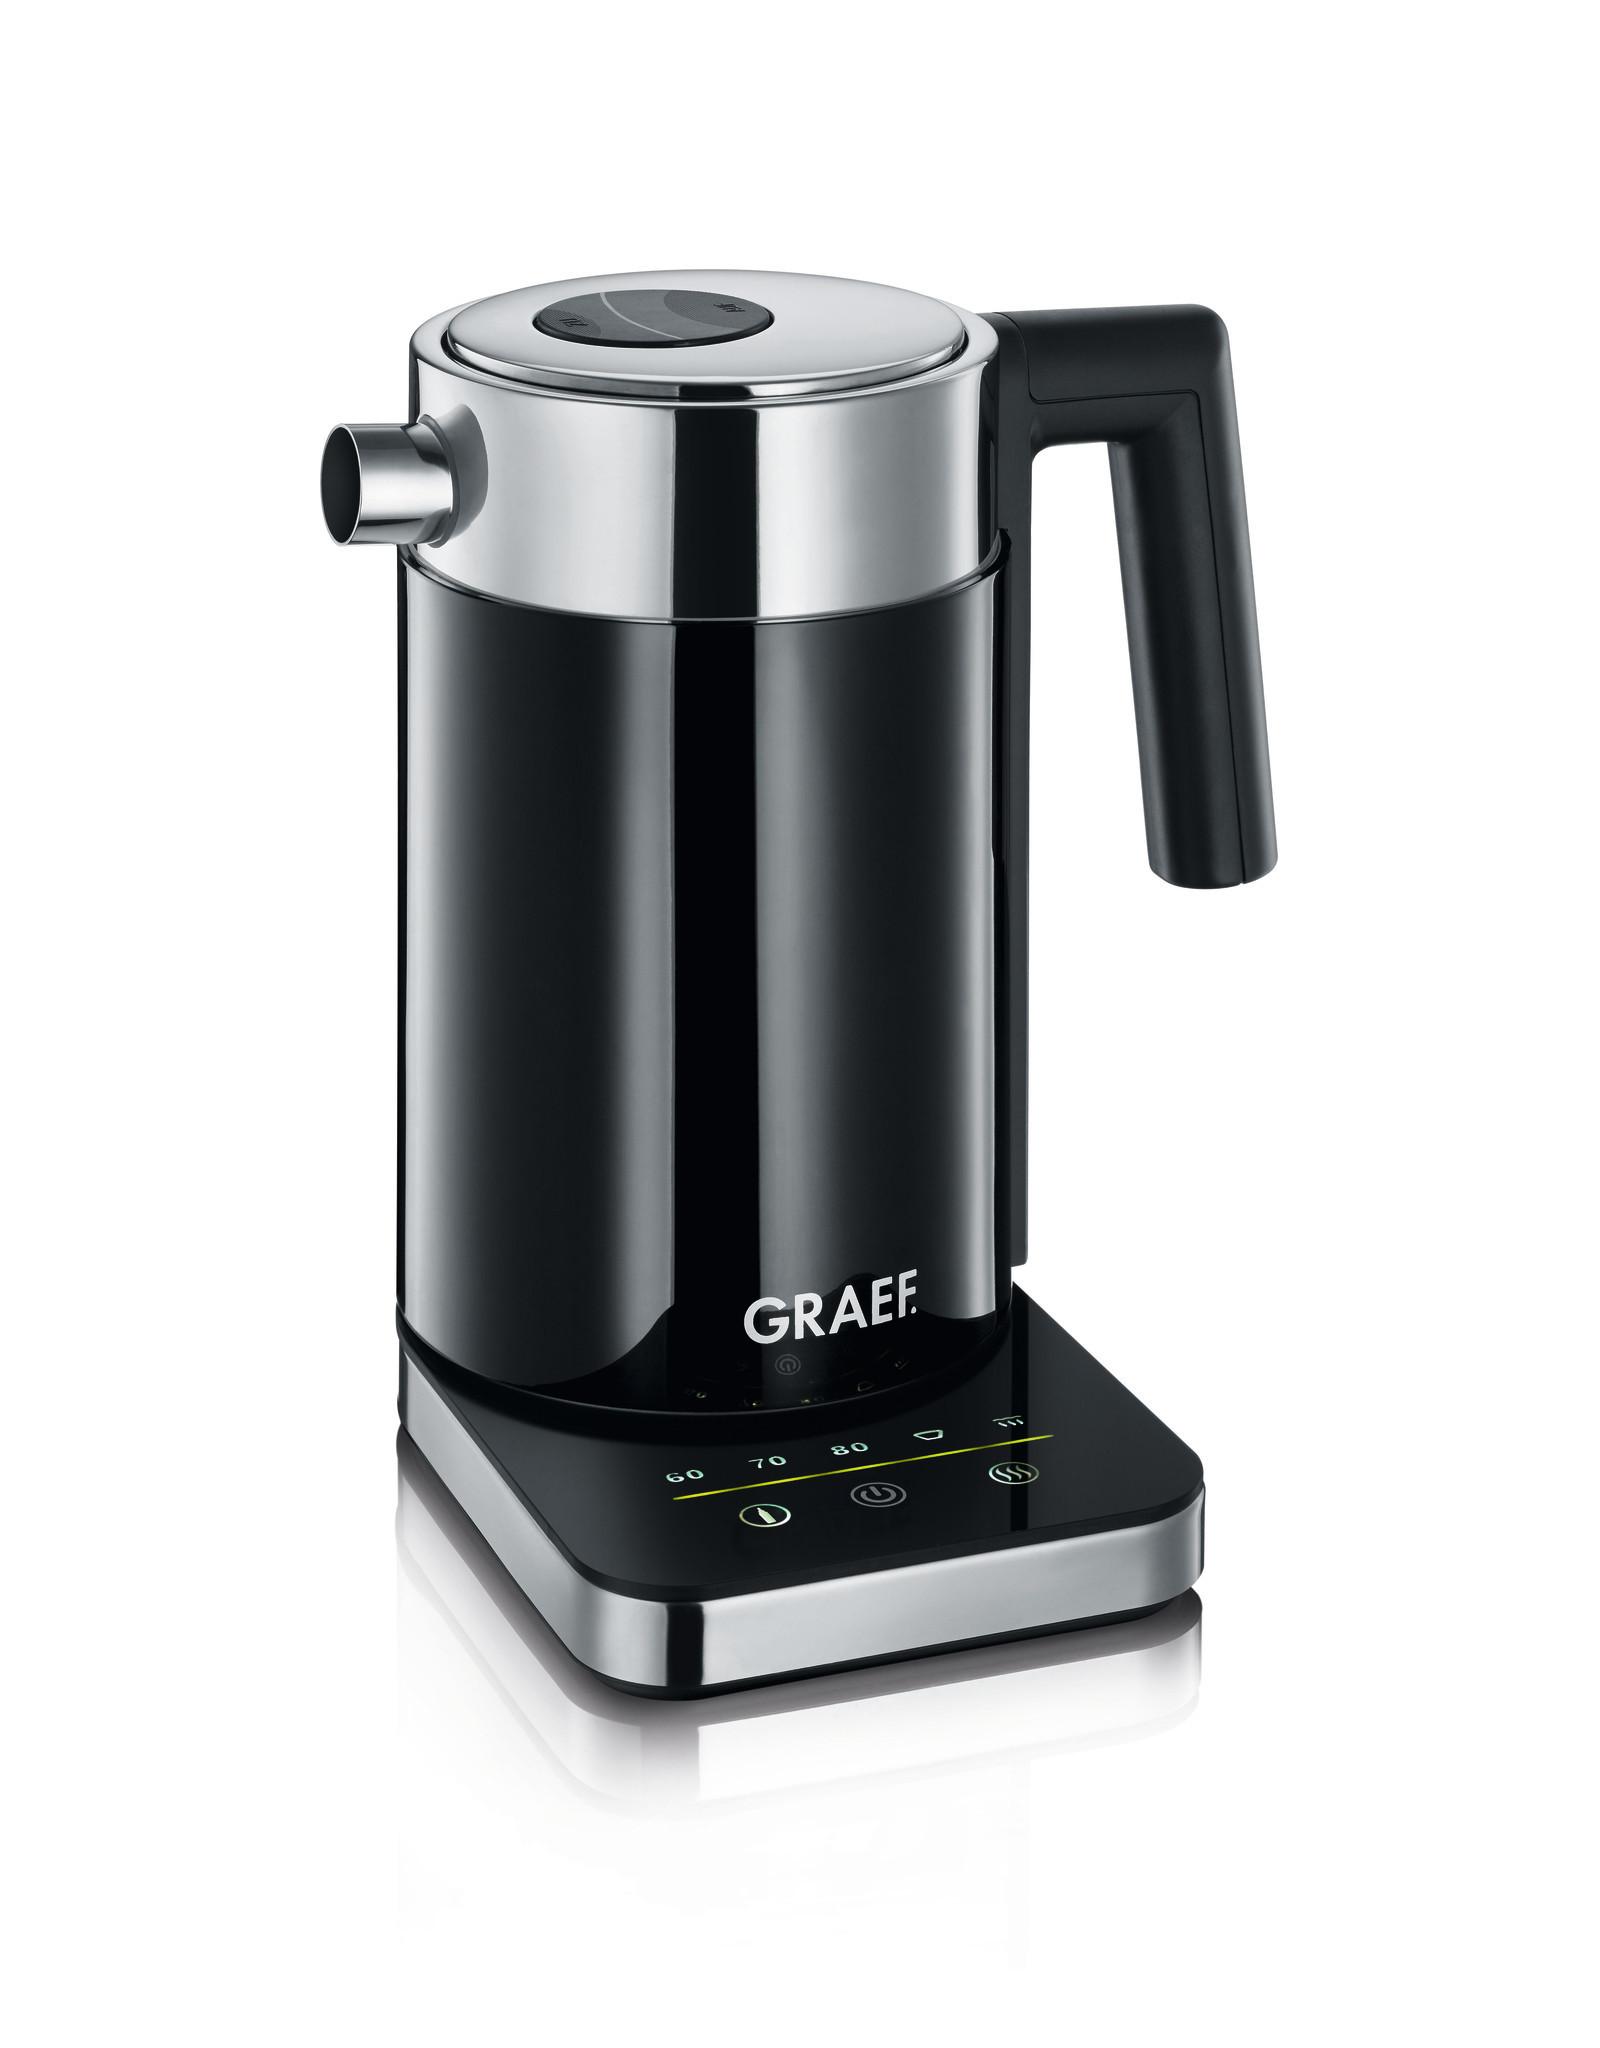 GRAEF GRAEF 45502 WATERKOKER 1 LTR. WK502 VARIABEL ZWART